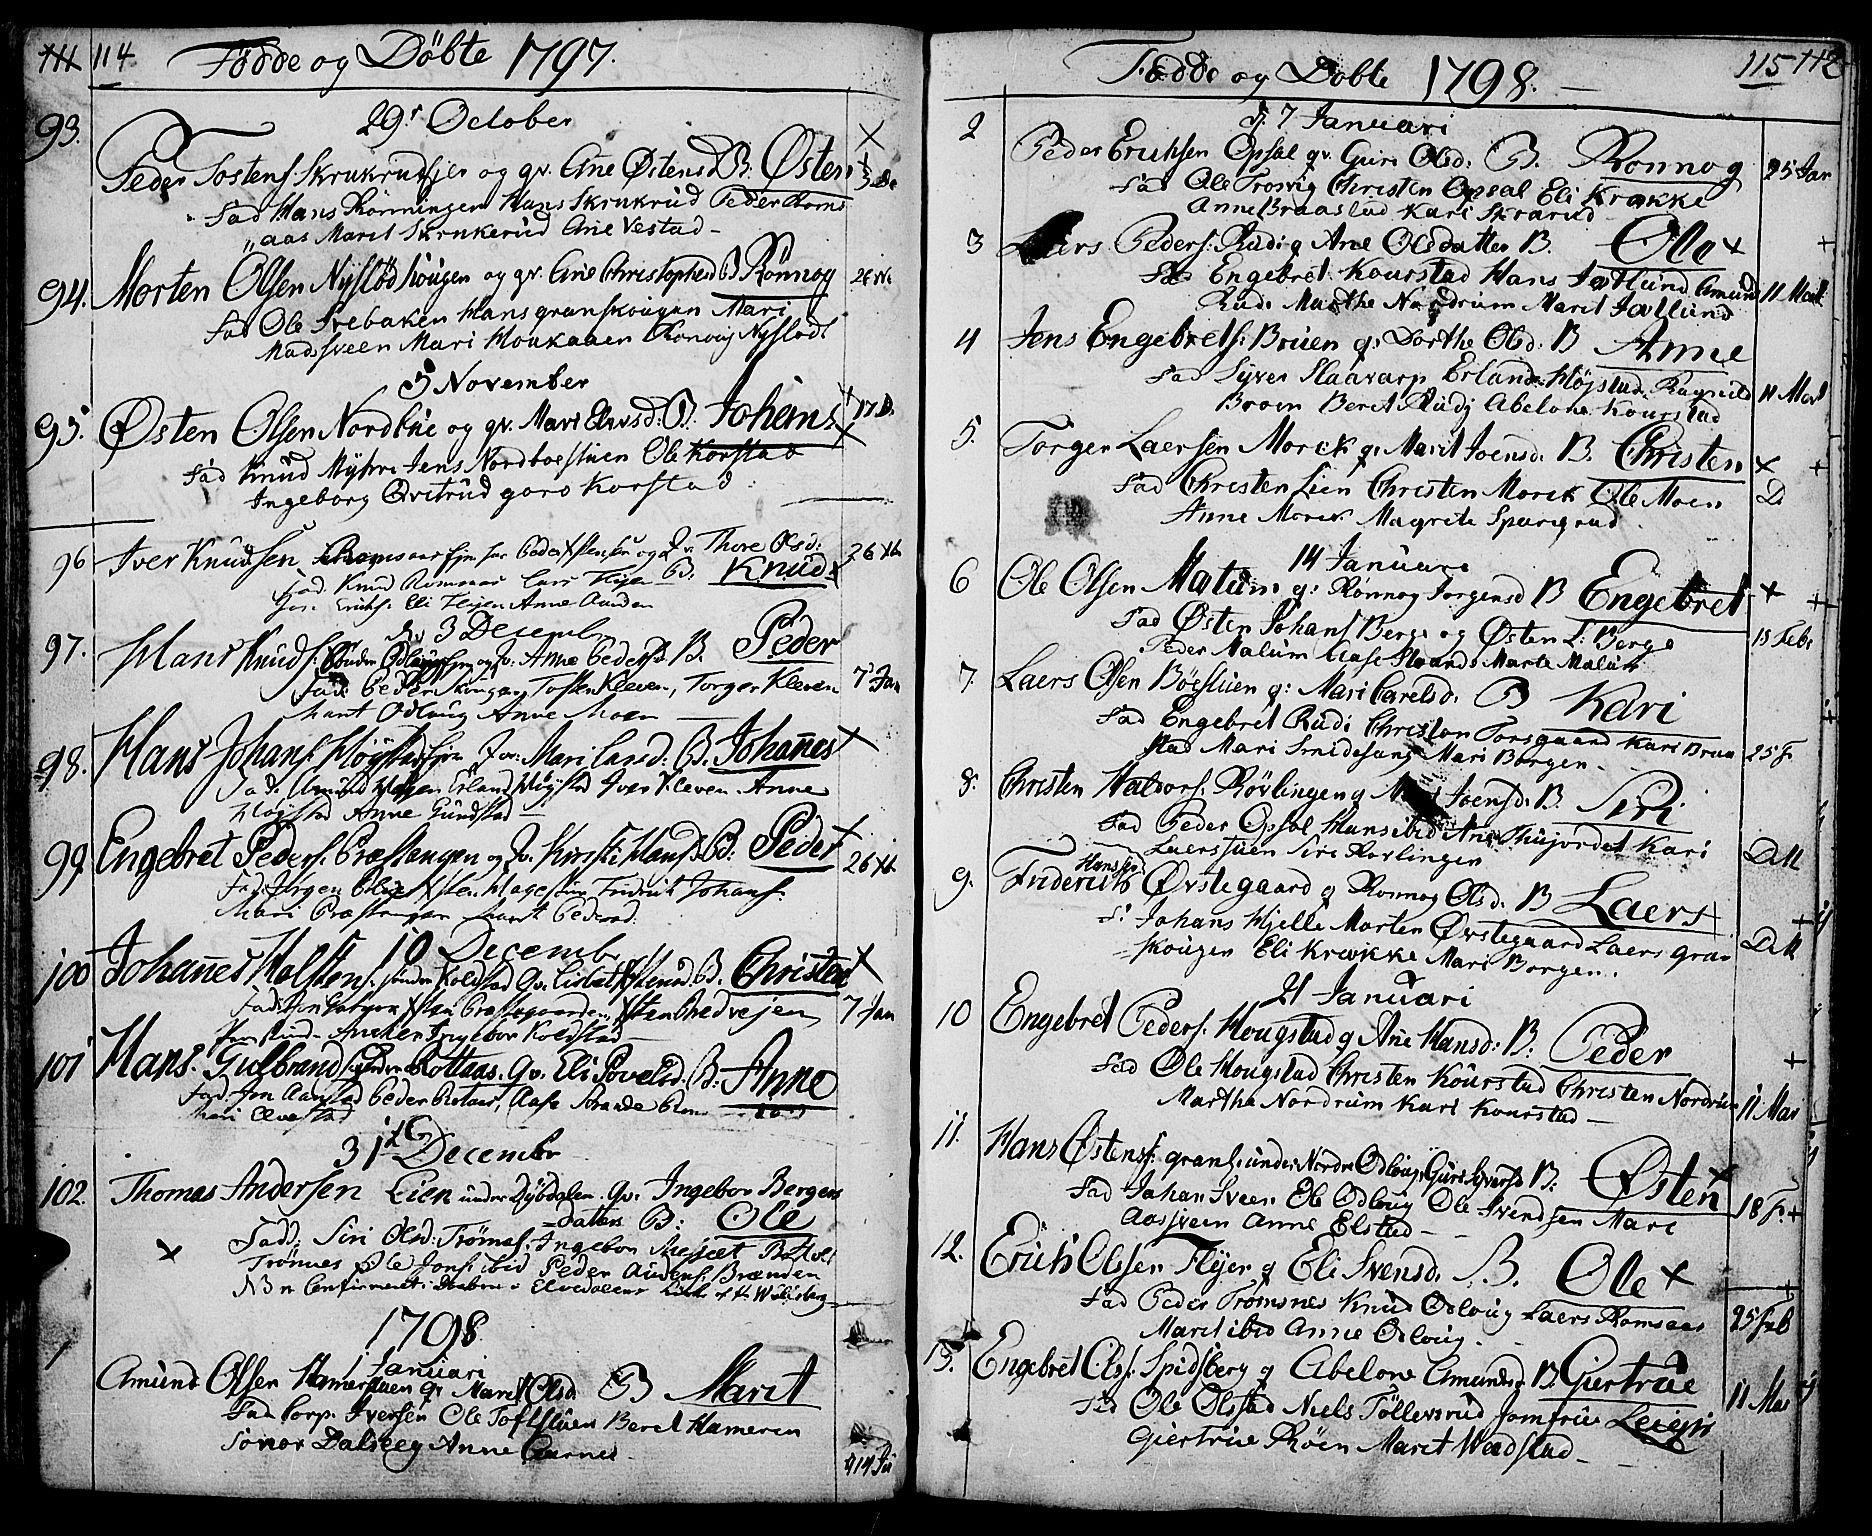 SAH, Ringebu prestekontor, Ministerialbok nr. 3, 1781-1820, s. 114-115